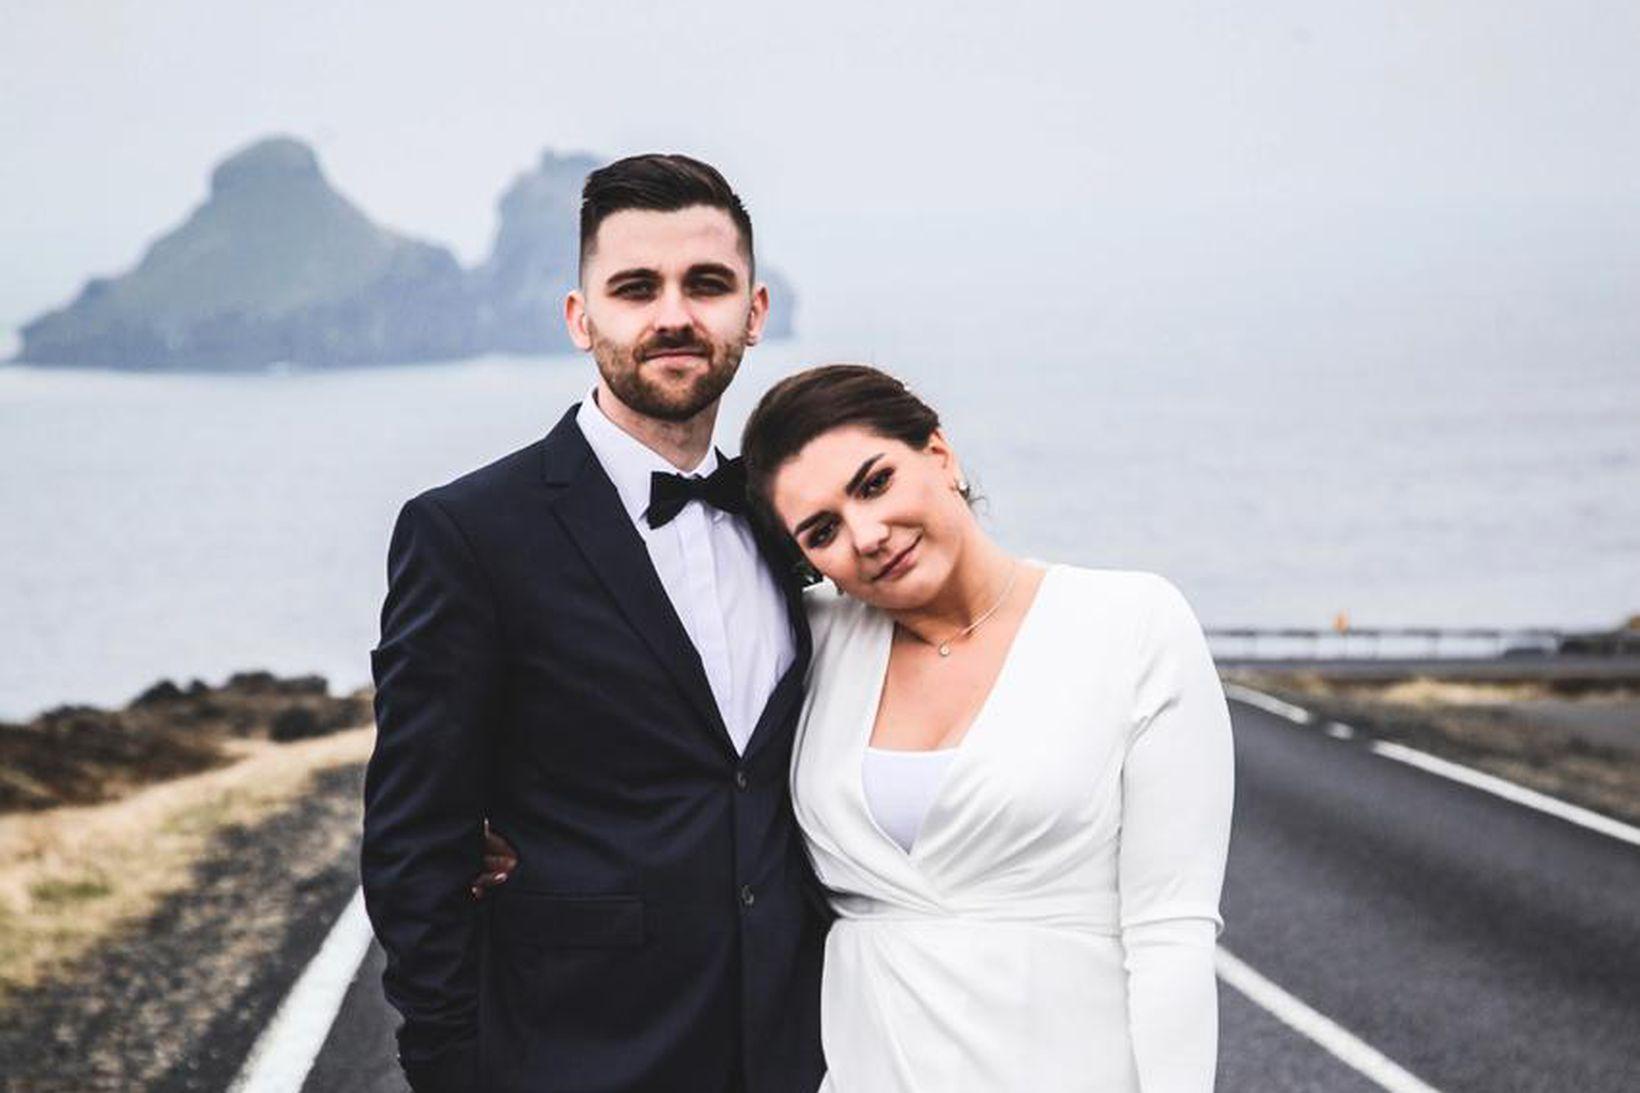 Klaudia Beata Wanecka og Marcin Wanecki vildu gifta sig á …